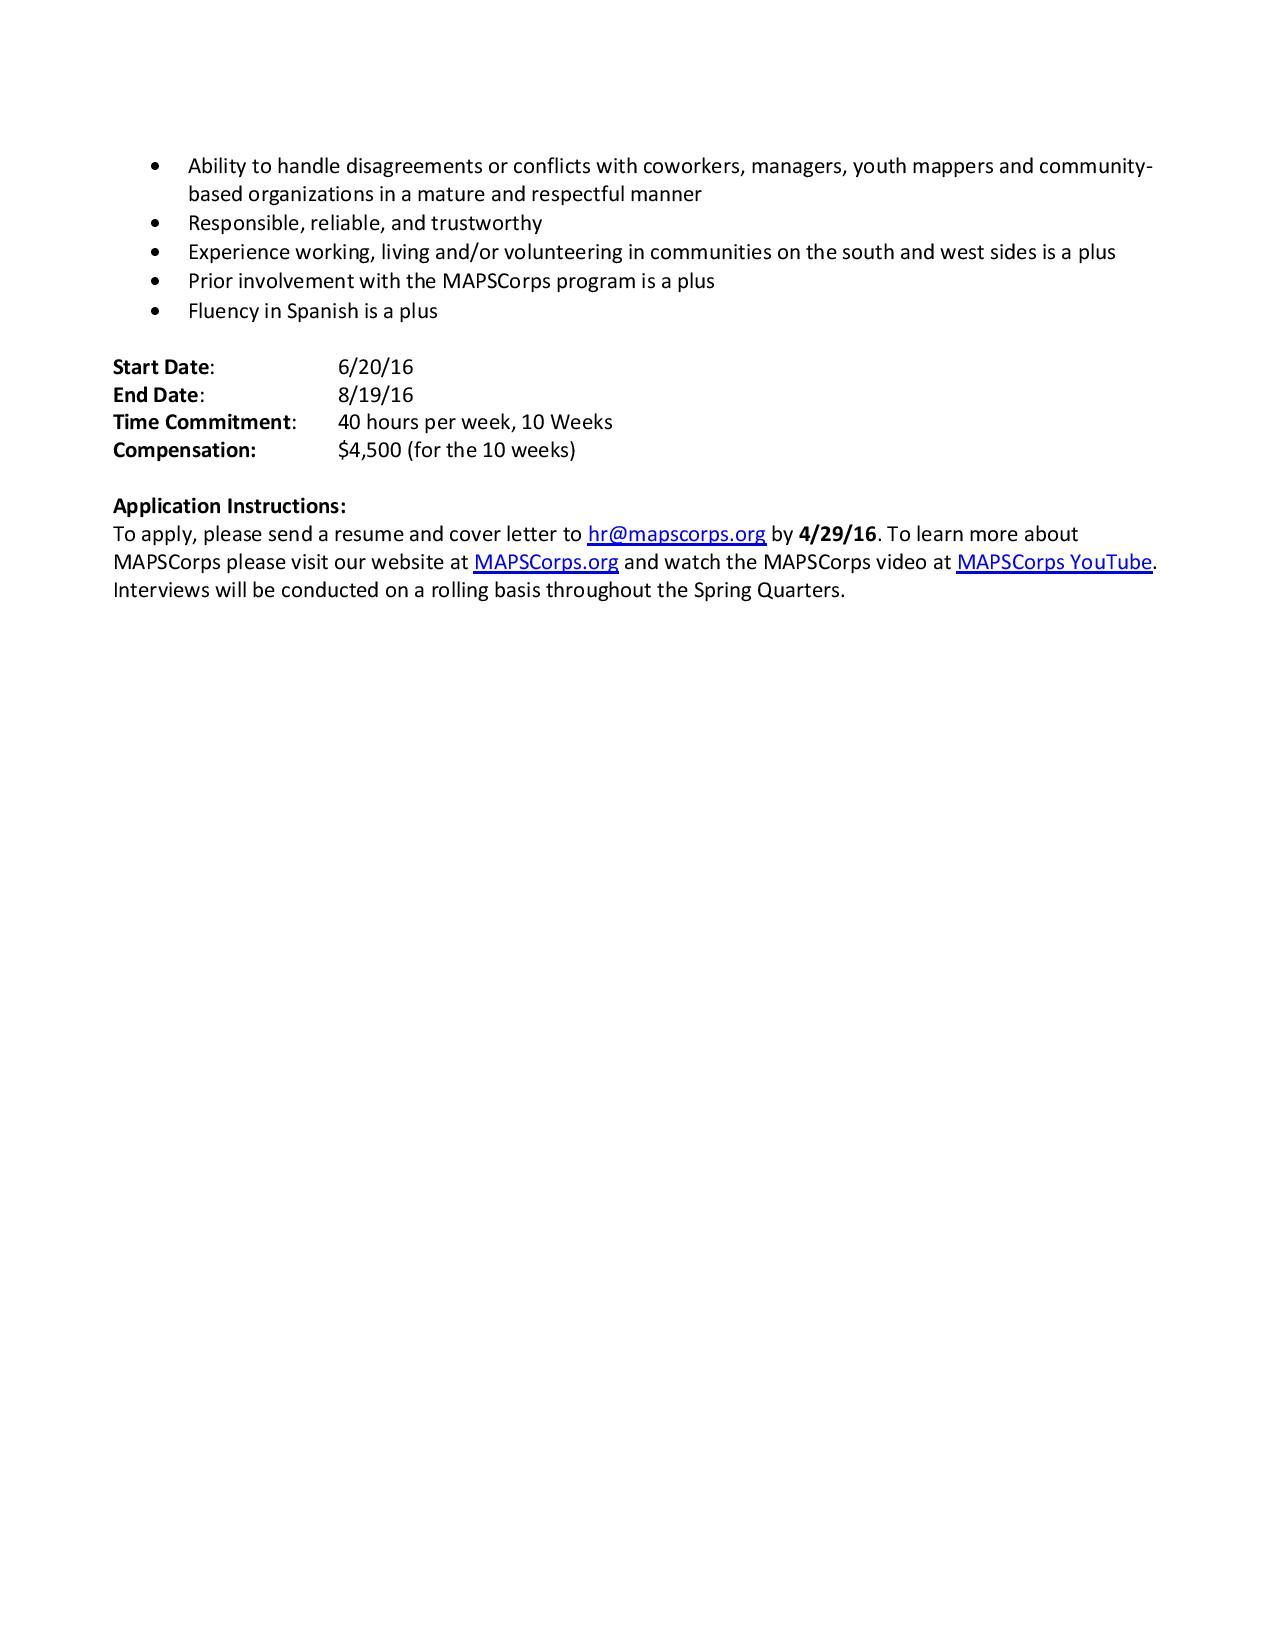 MAPSCorps Coordinator Job DePaul Psychology – Program Coordinator Job Description